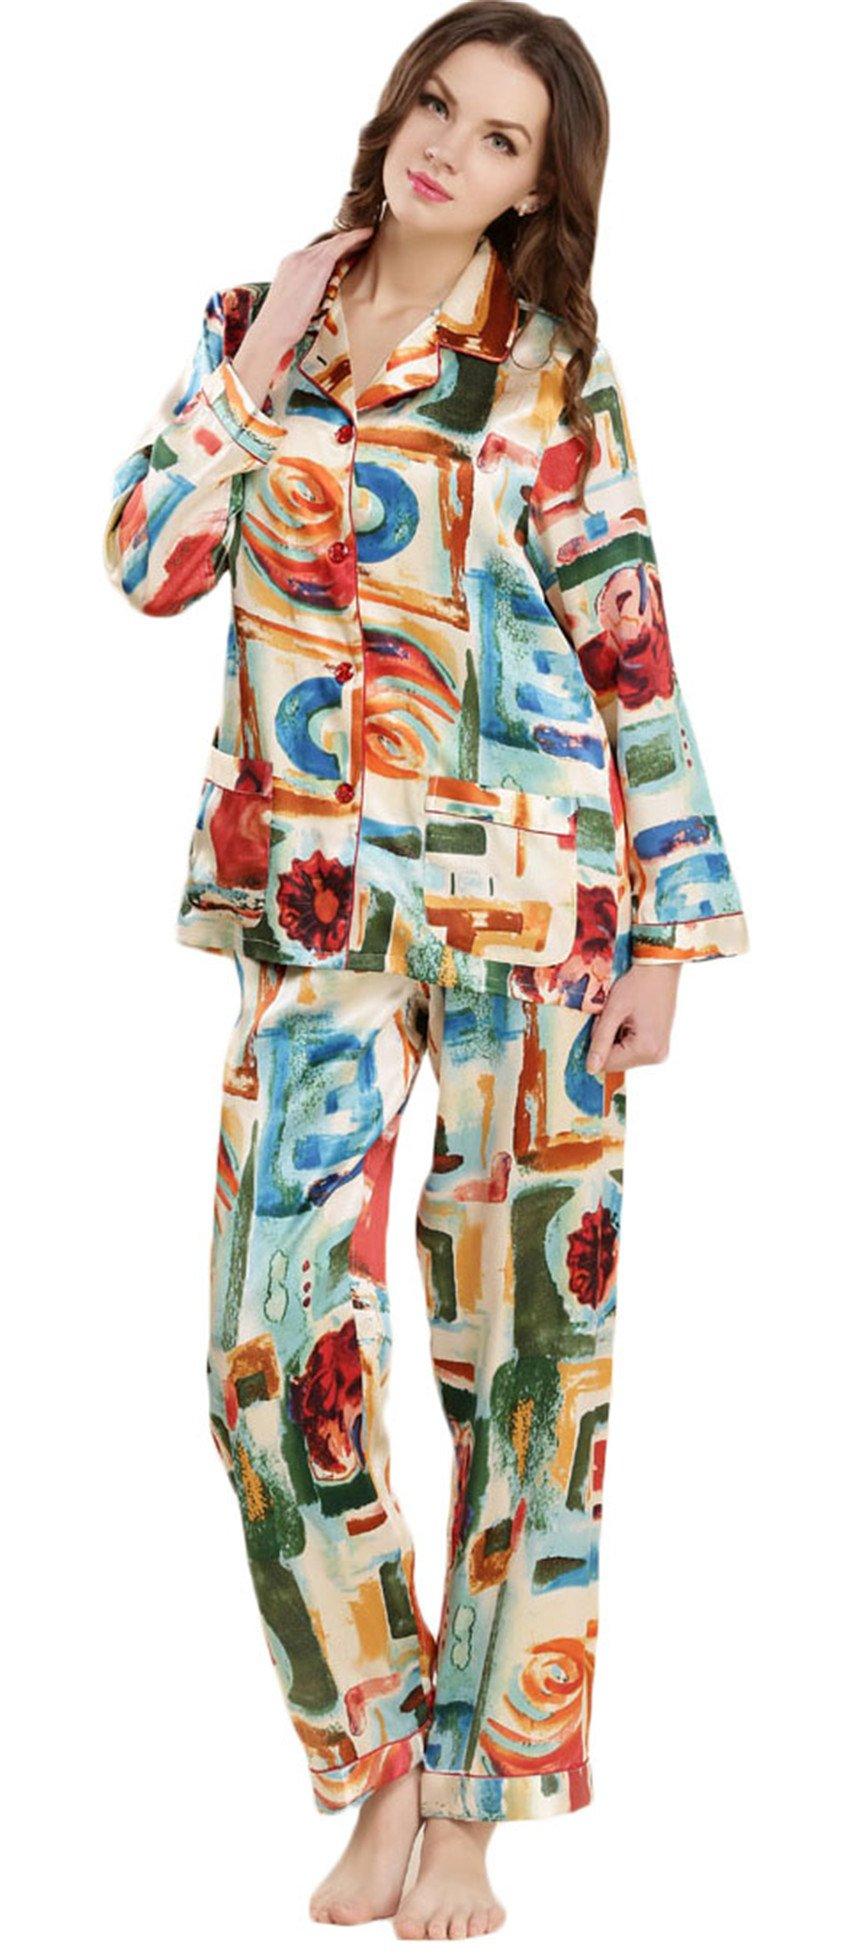 Women's Pure Mulberry Silk Pajama Set Long Sleeve Printed Classic Luxury Sleepwear Cai L